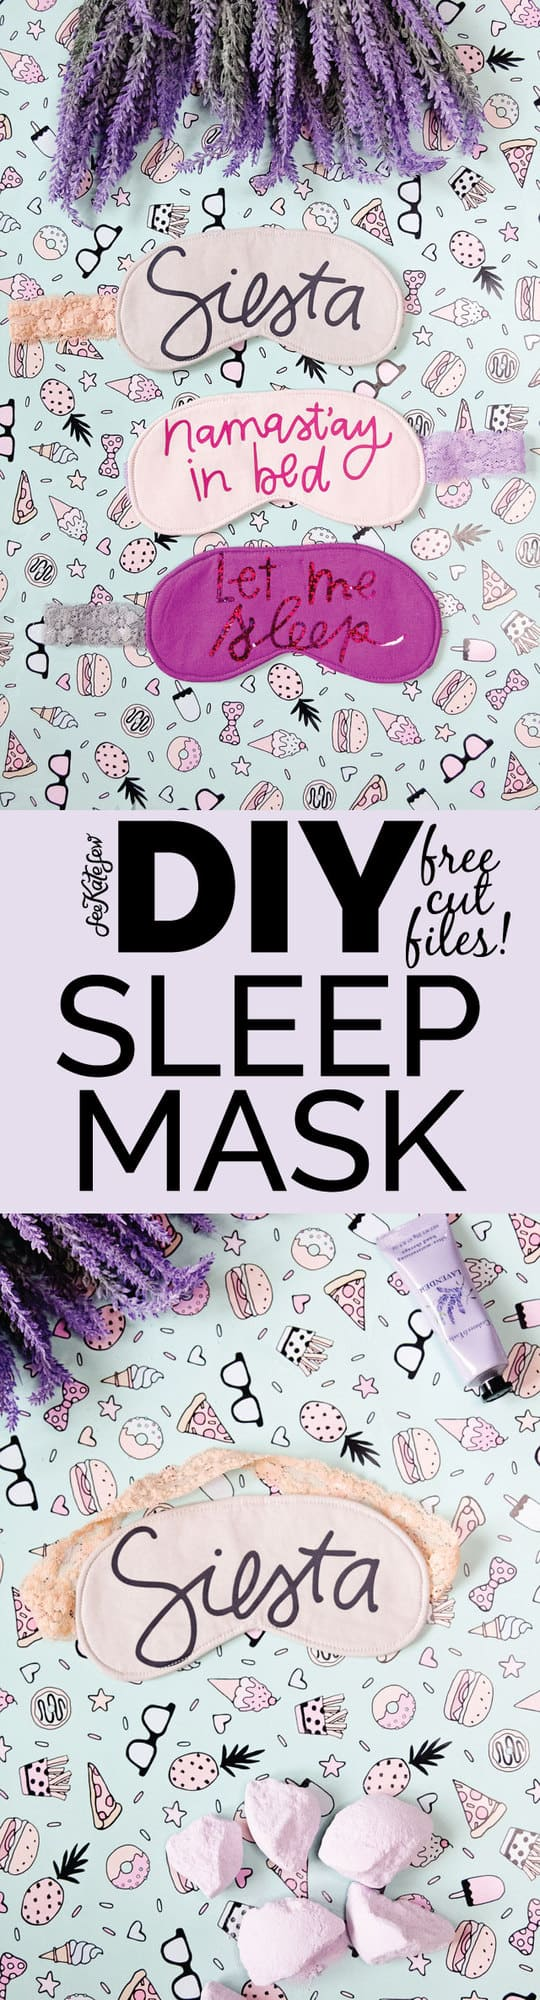 DIY sleep mask with cut files